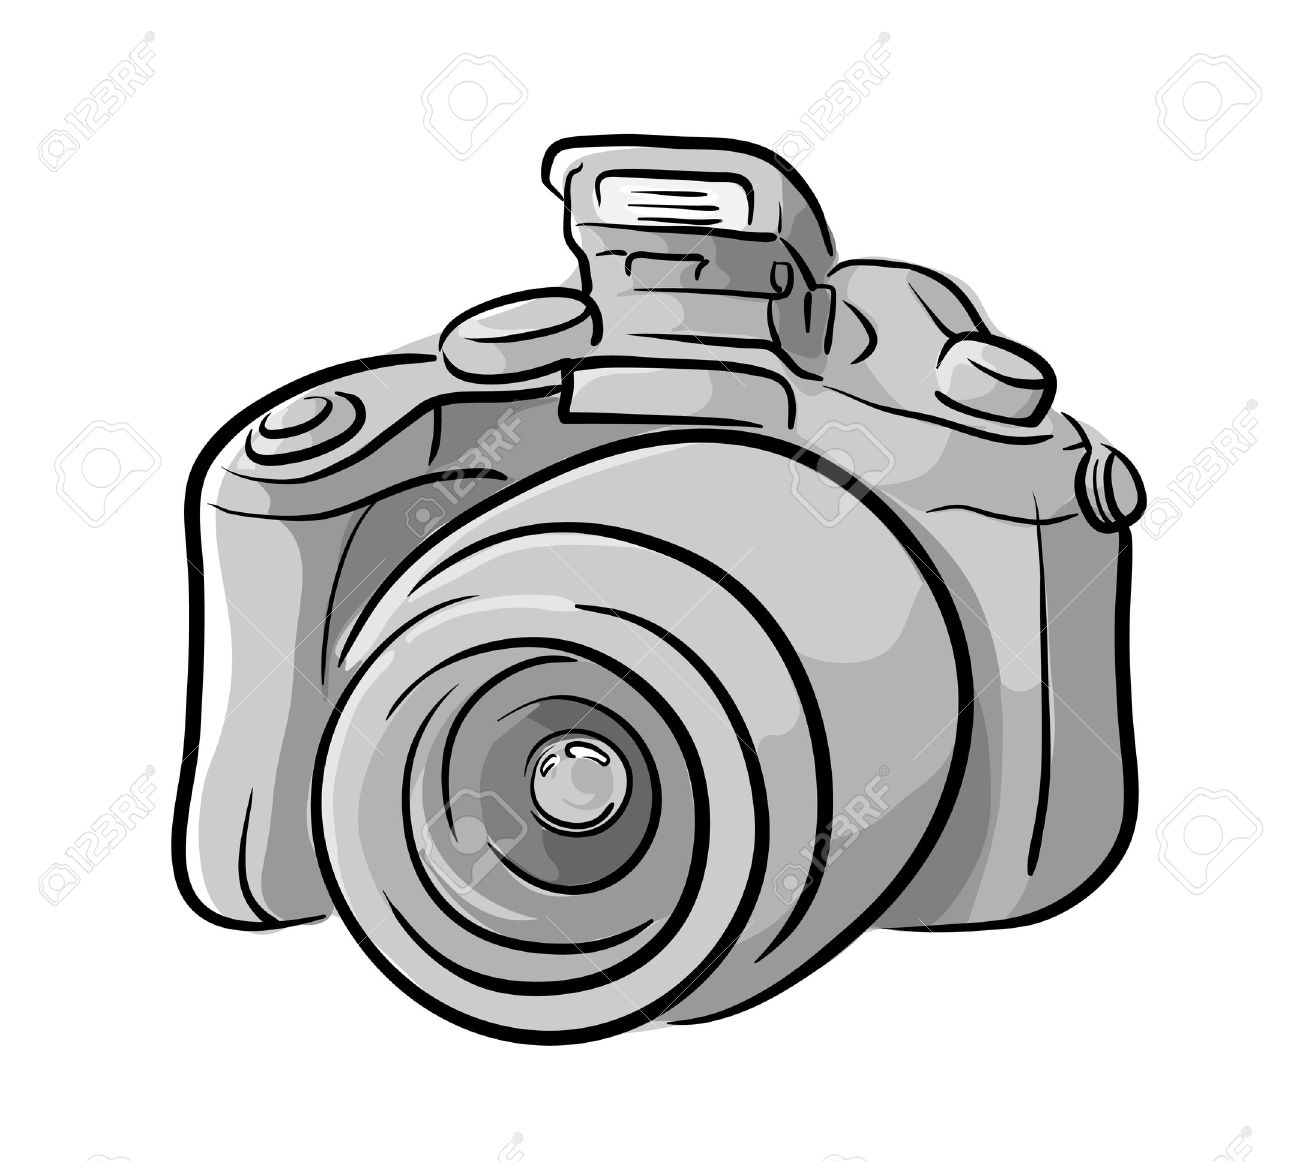 Dslr Camera A Hand Drawn Vector Illustration Of A Dslr Camera Royalty Free Cliparts Vectors And Stock Illustration Image 57608739